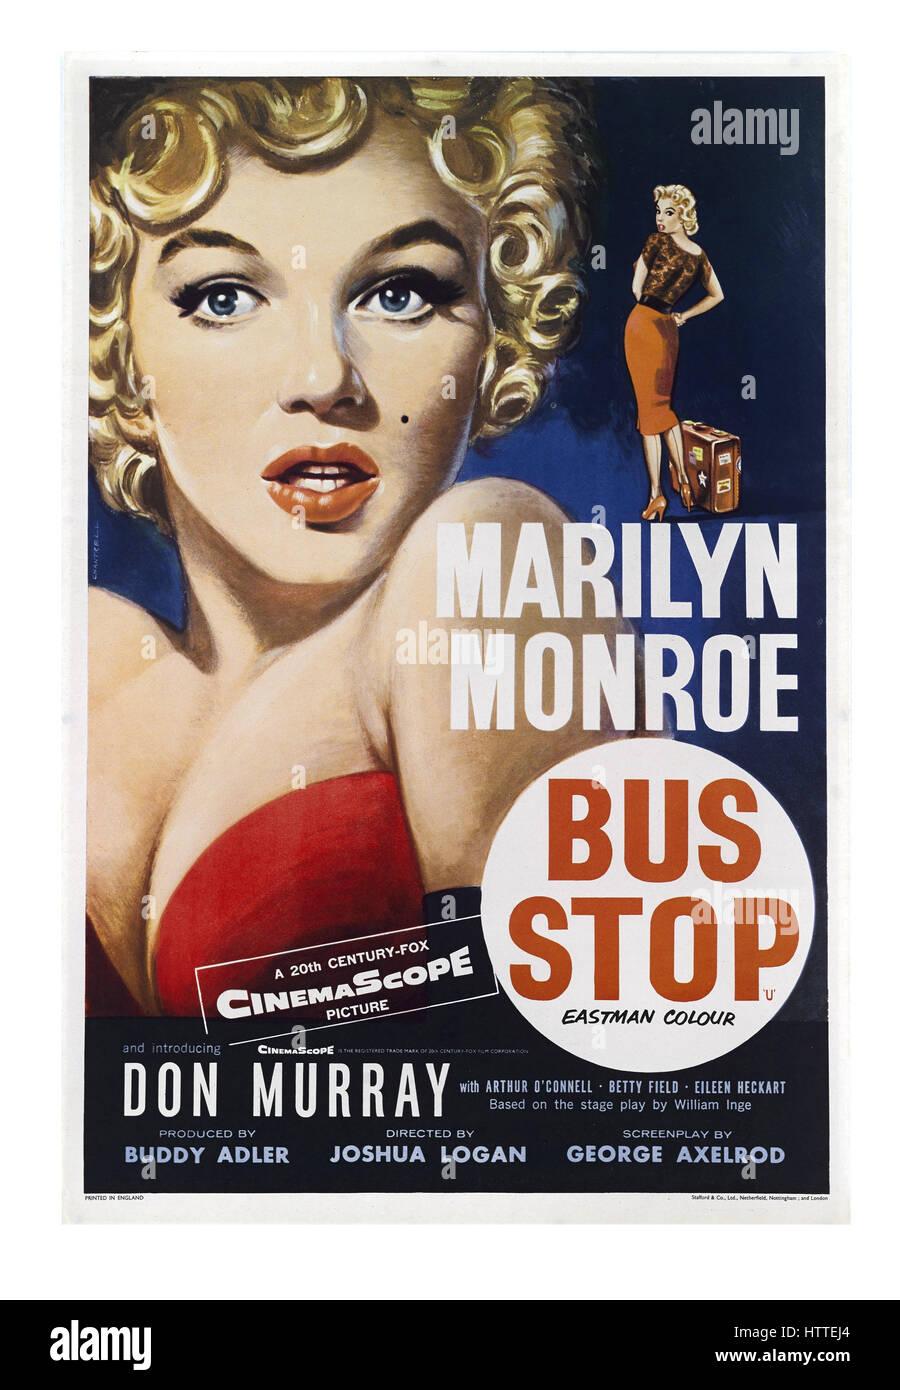 Vintage retro film poster of American Film star Marilyn Monroe starring in 1956 movie 'Bus Stop' - Stock Image